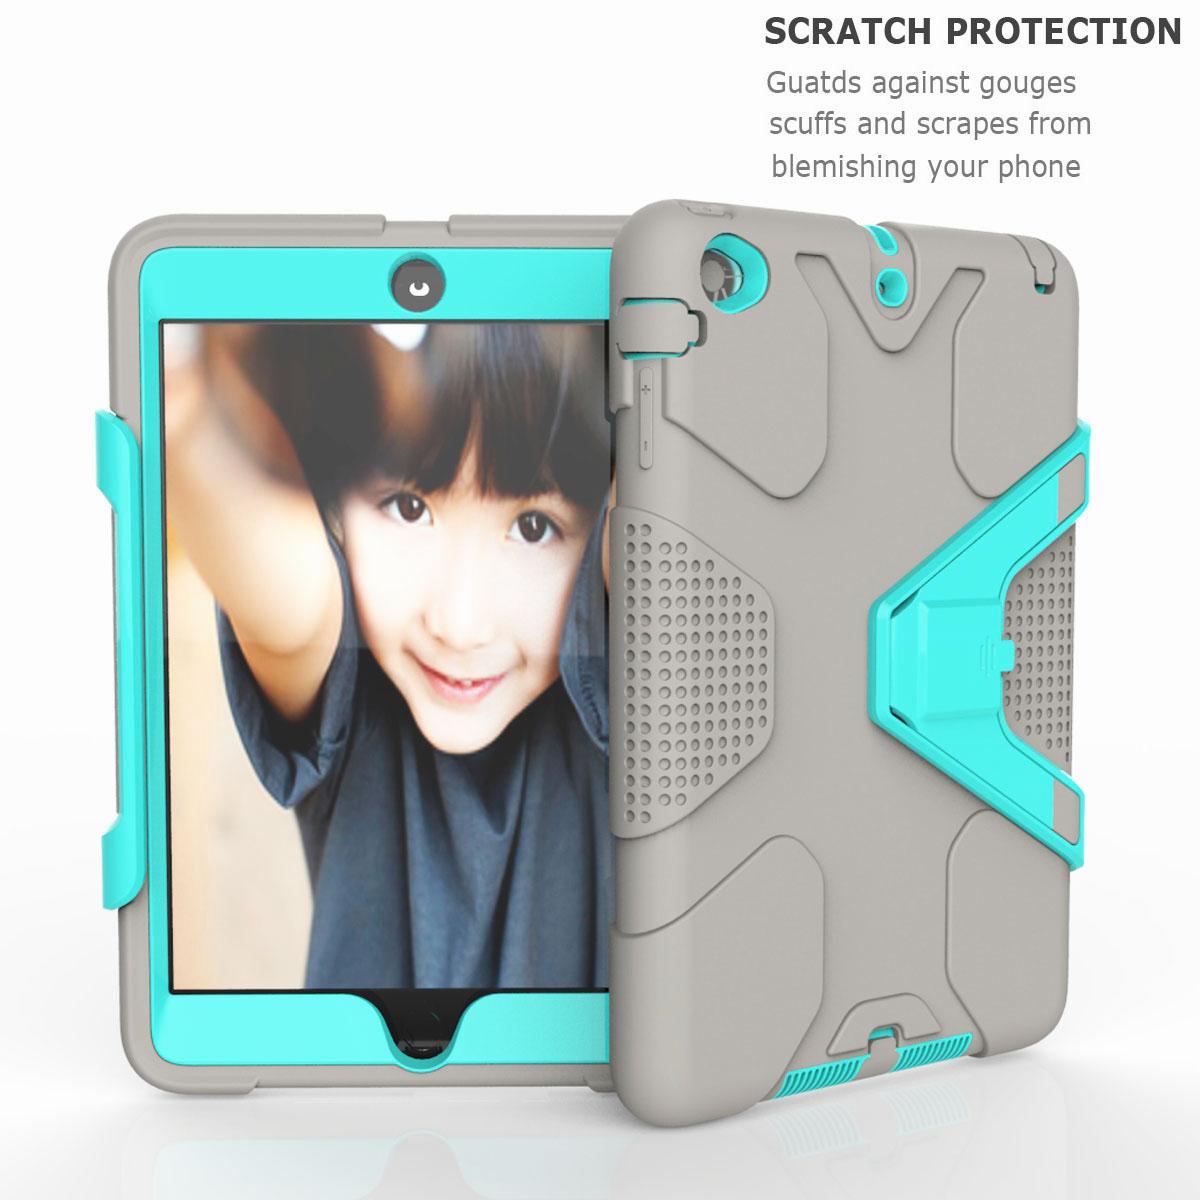 Luxury-Shockproof-Tough-Armor-with-Hard-Kickstand-Case-For-Apple-iPad-Mini-1-2-3 thumbnail 26